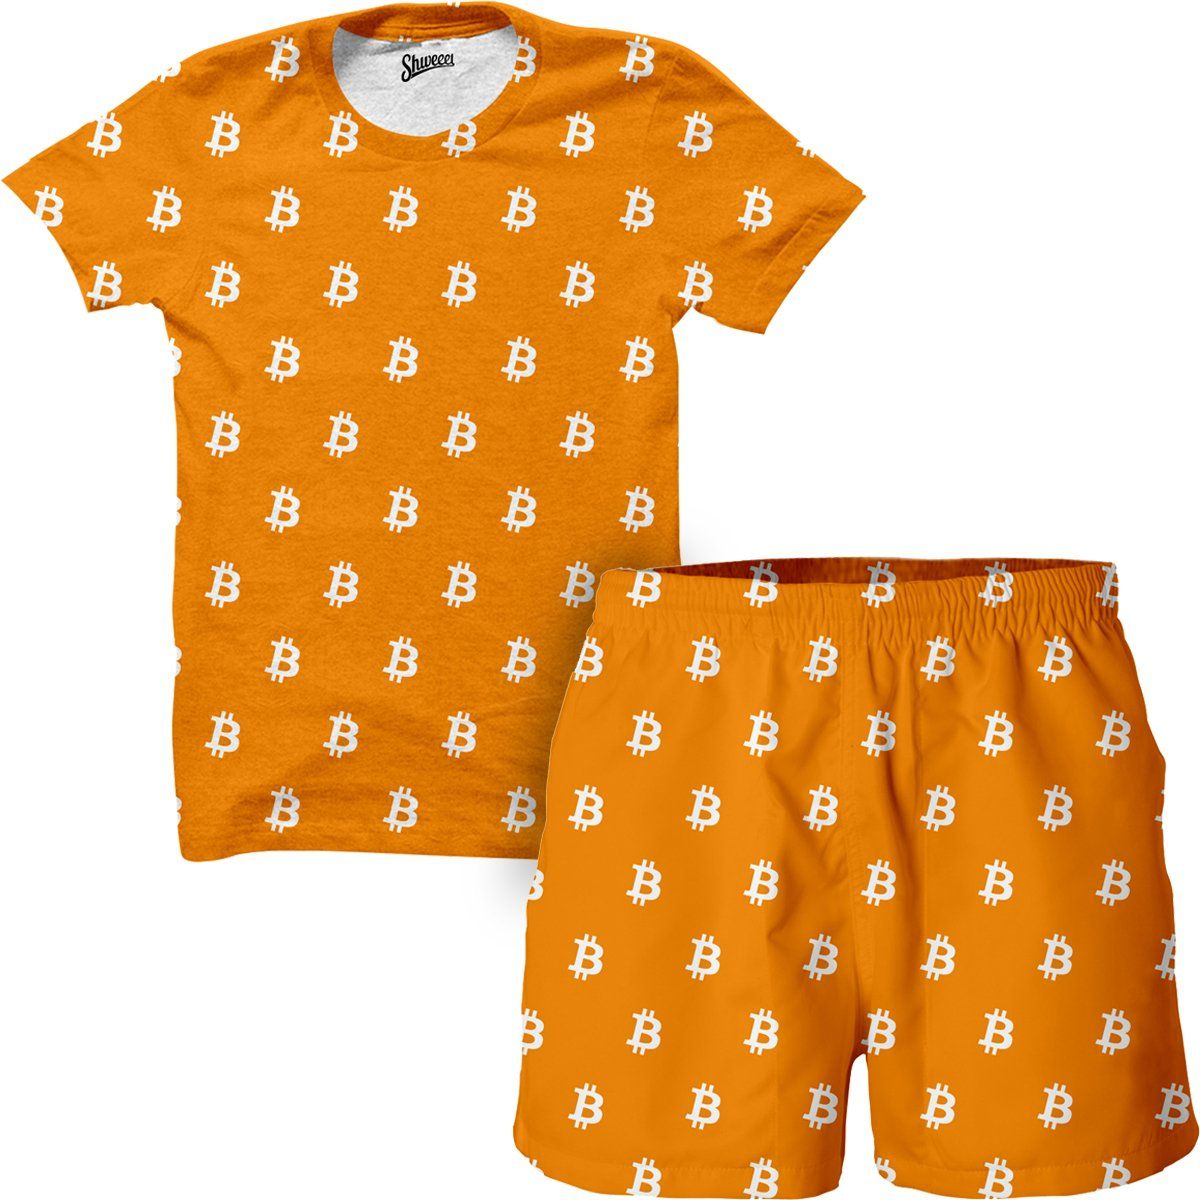 Bitcoin Shirt and Shorts Combo (With images) Bitcoin